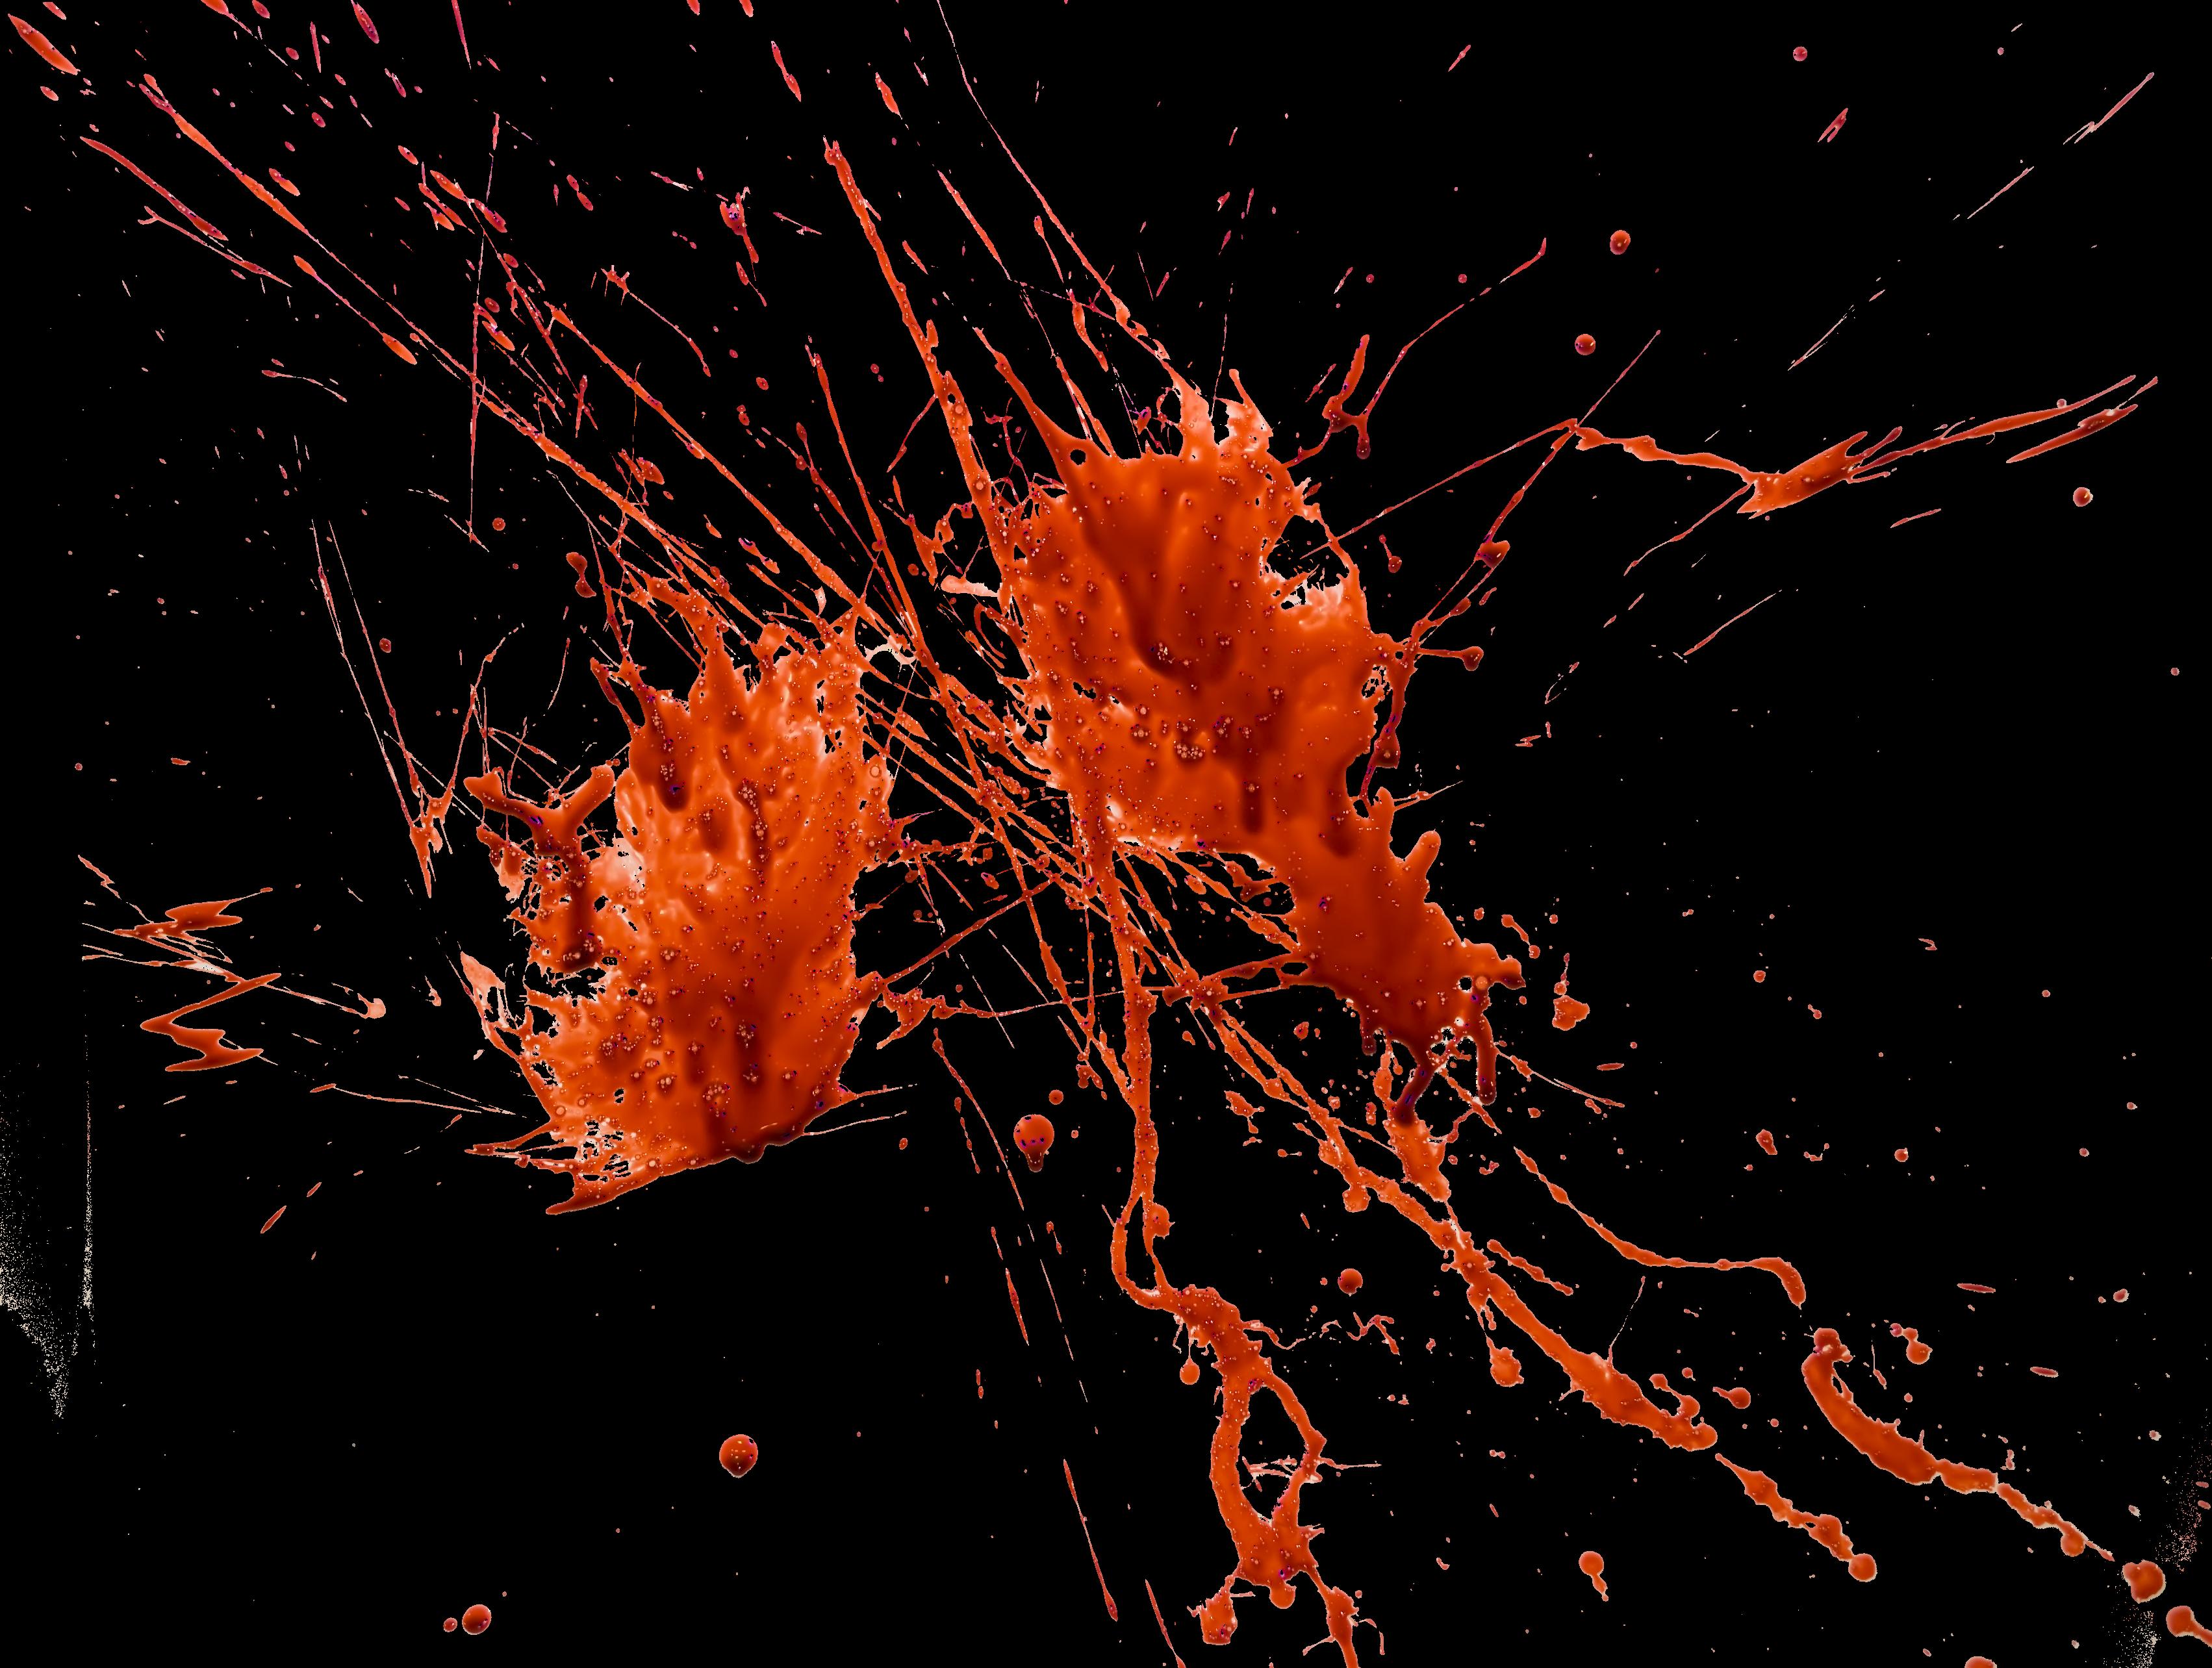 Blood smear png. Images free download splashes